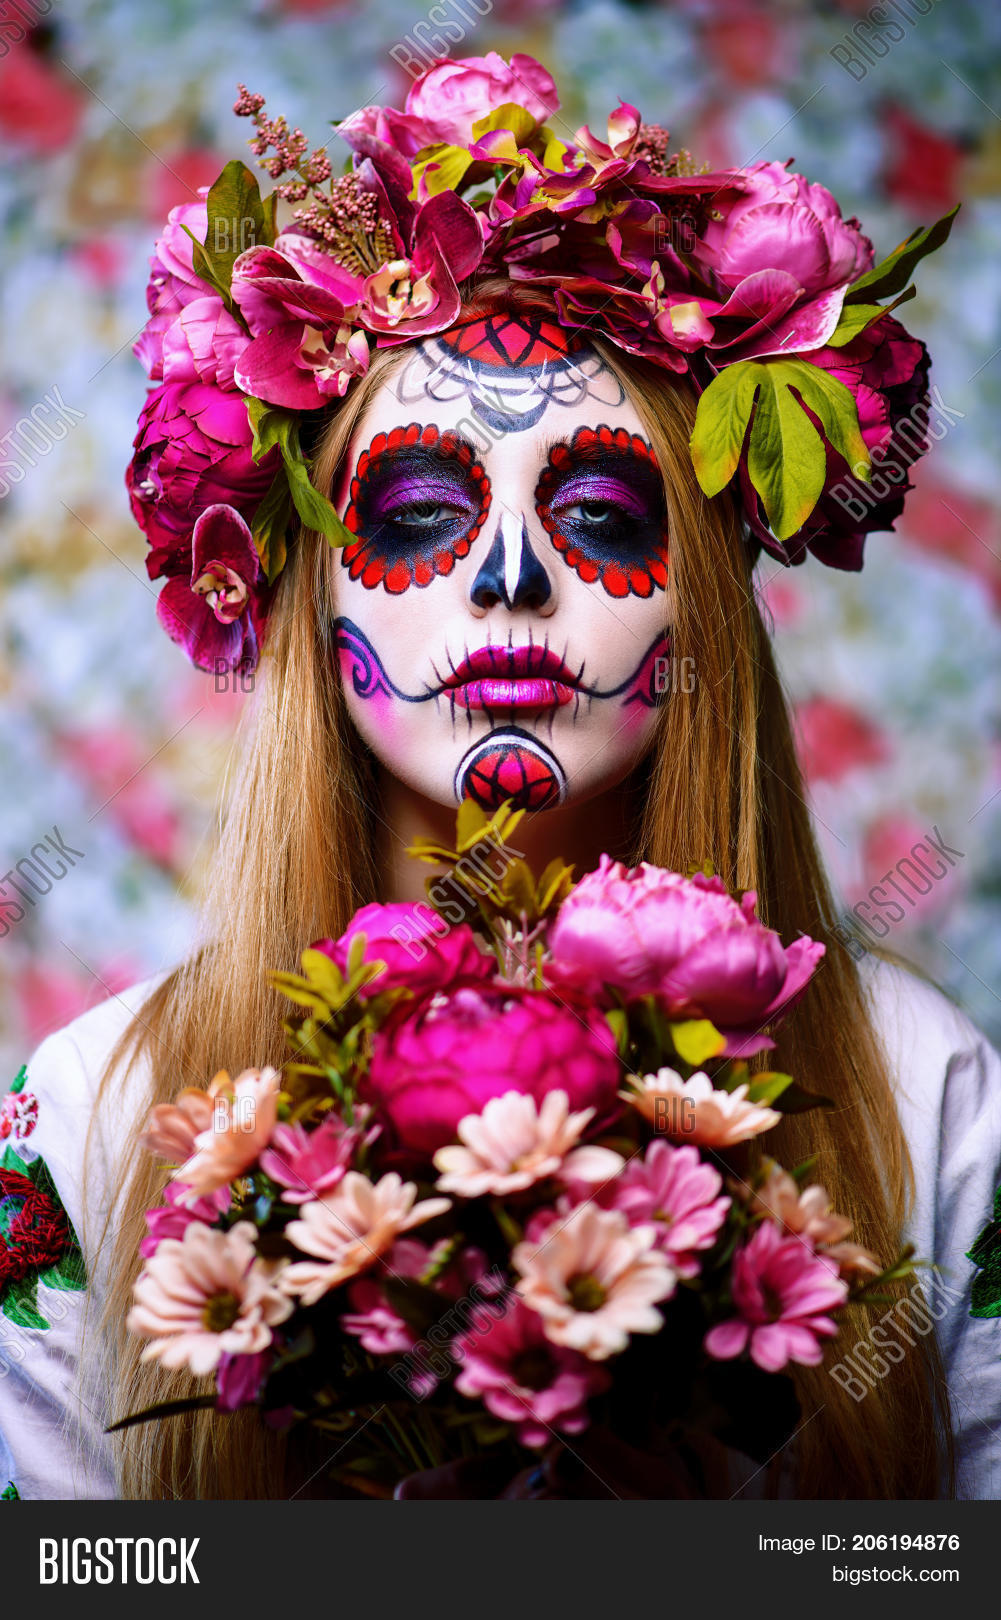 88cdce809 Dia de los muertos. Day of The Dead. Woman with sugar skull makeup on